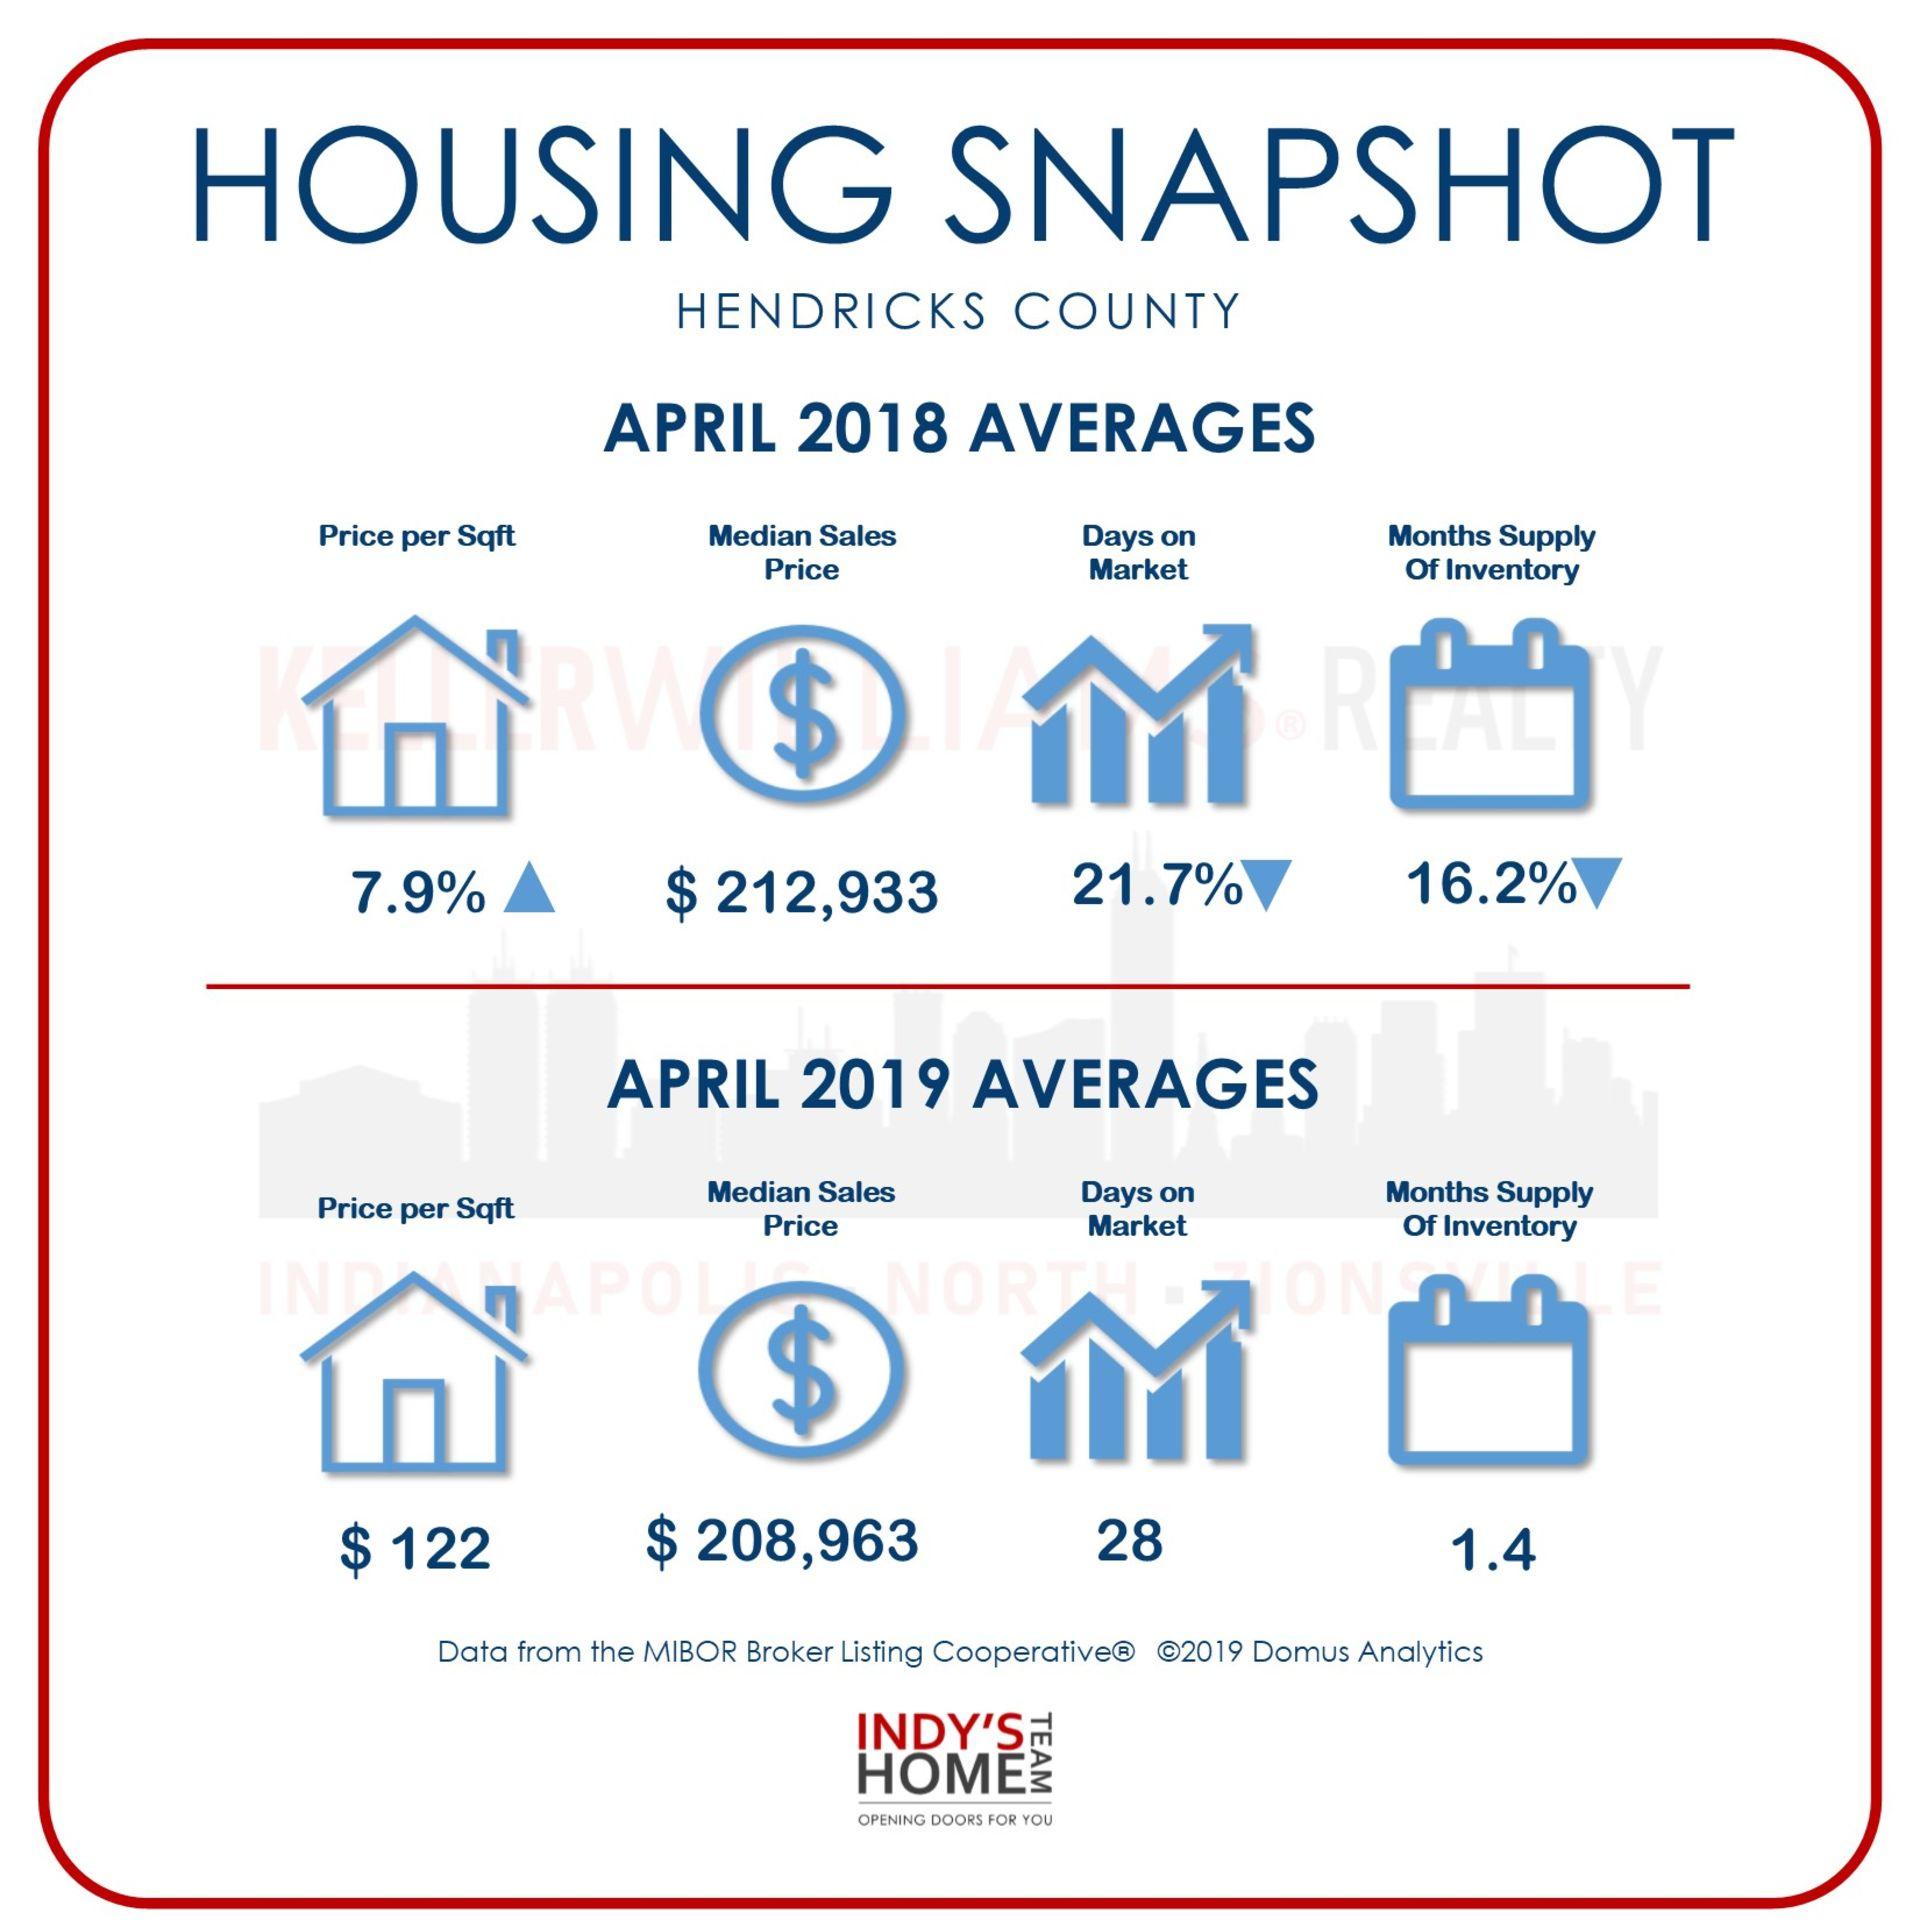 HOUSING SNAPSHOT of HENDRICKS, INDIANA for April 2018 – 2019